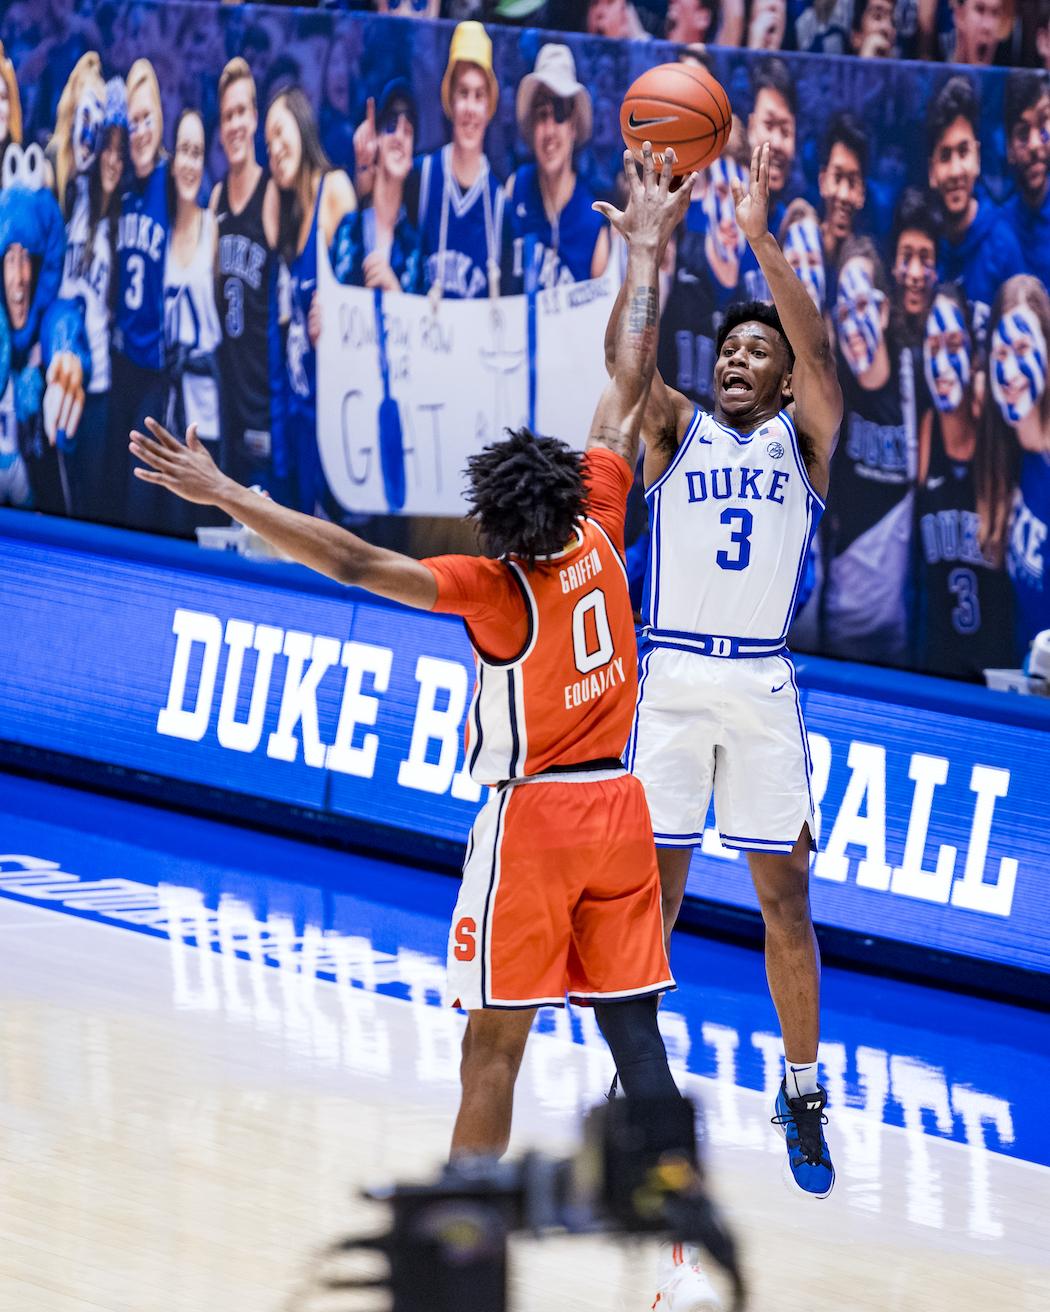 Duke Men's Basketball takes on the Syracuse University Orange in the first half at the Cameron Indoor Stadium on February 22, 2021 at Durham, North Carolina.